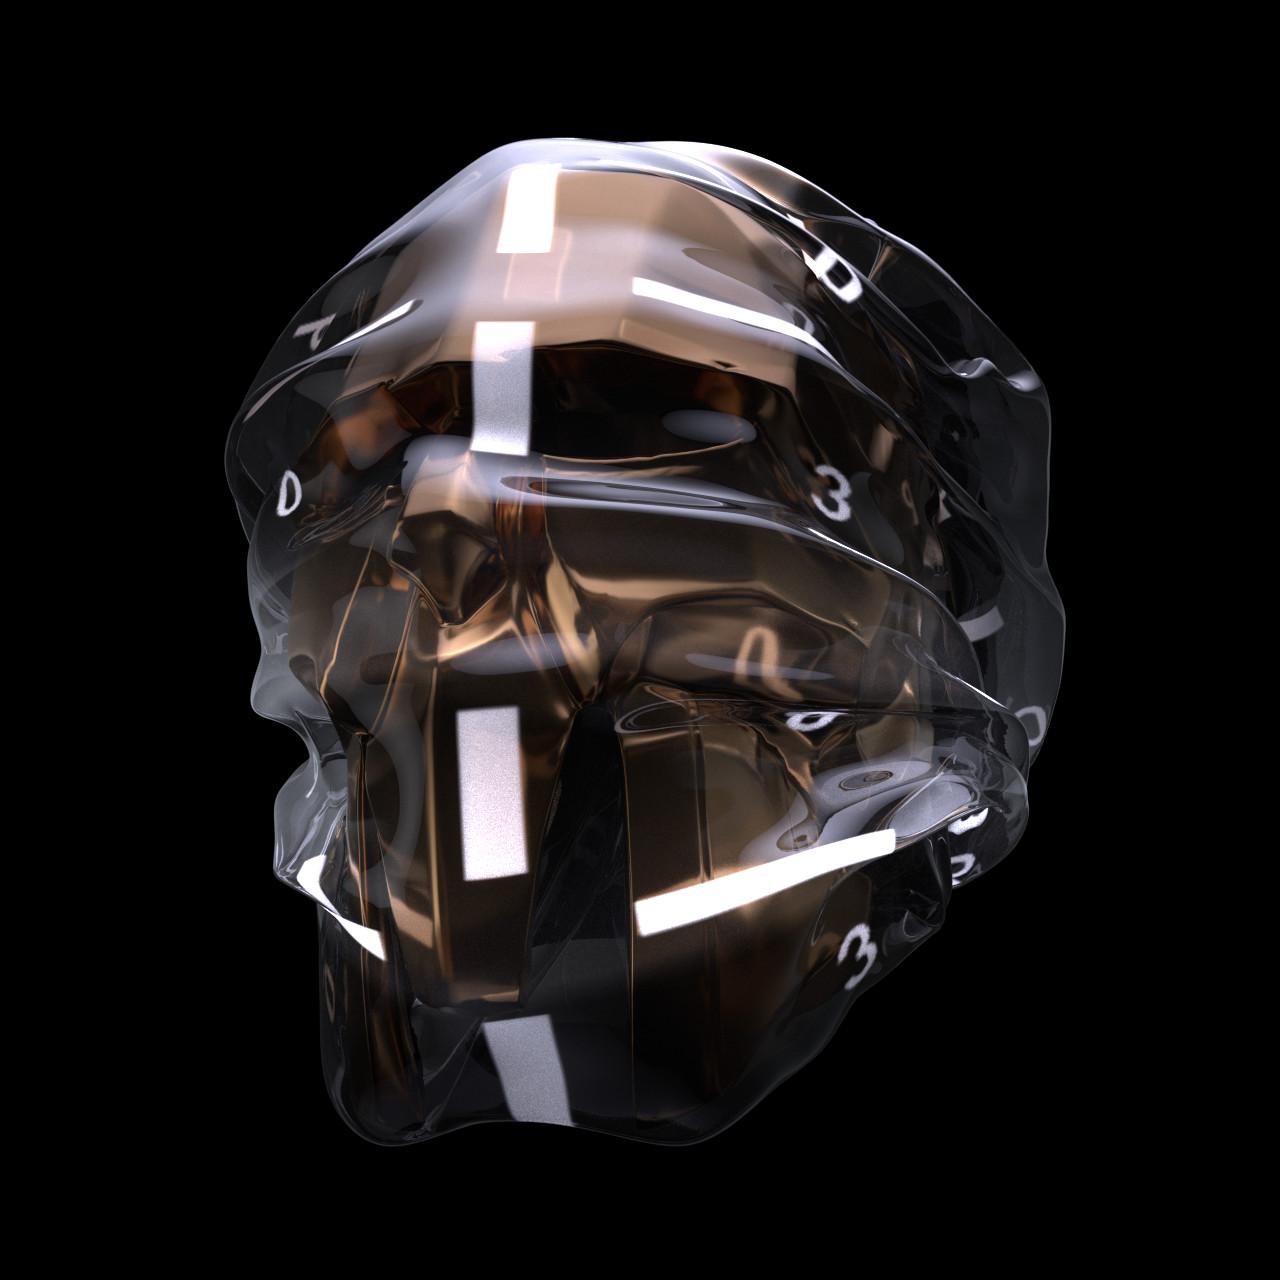 Ry cloze helmet bag3 0206